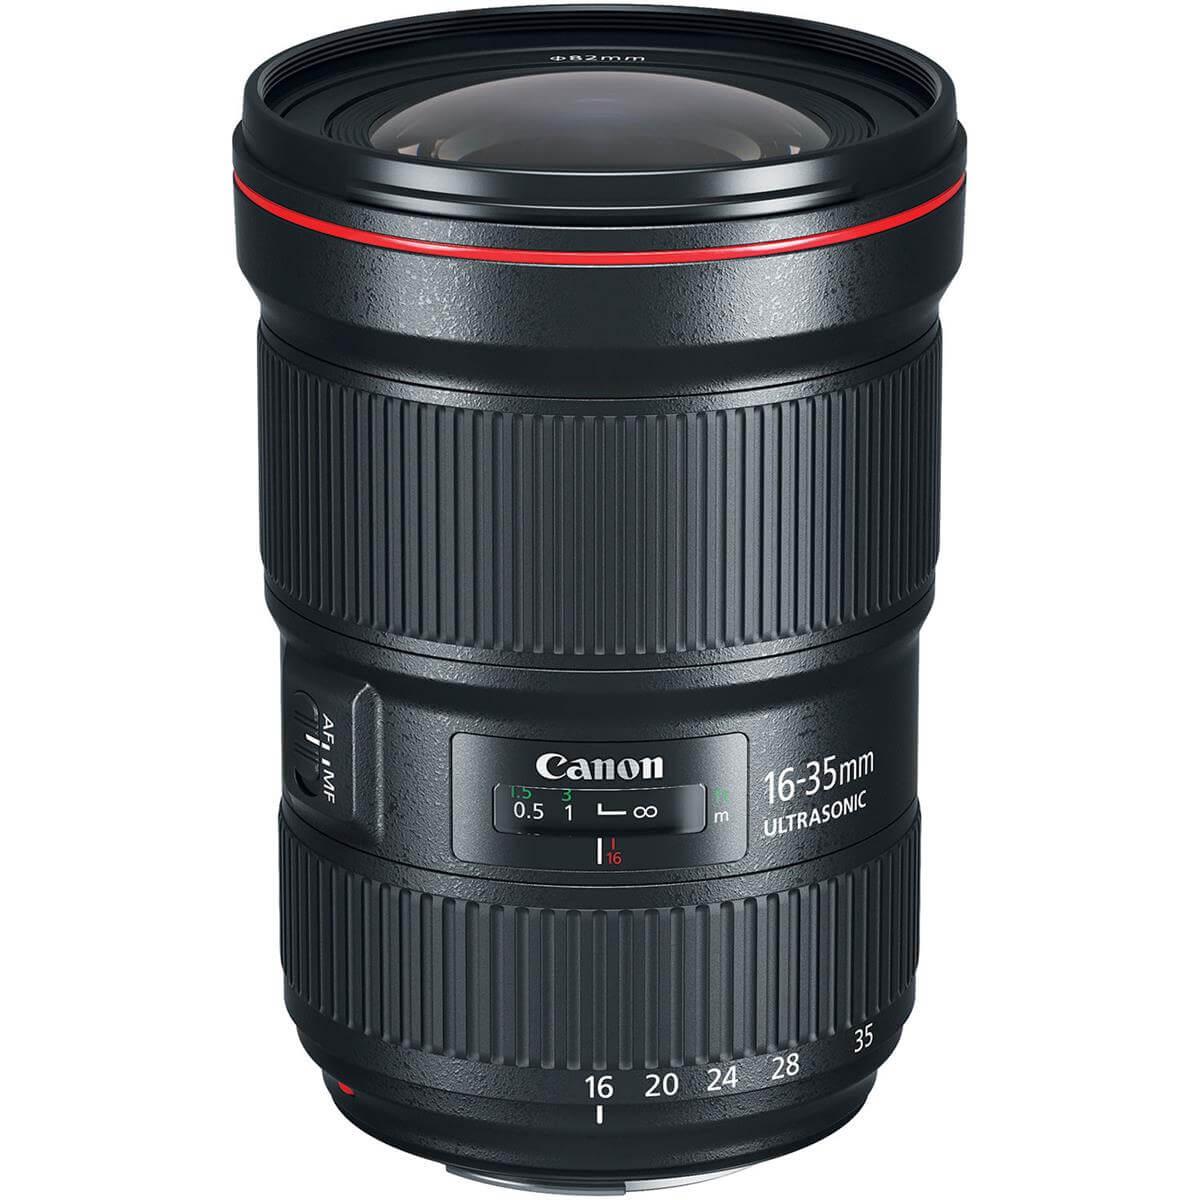 989918_4118-lente-canon-ef-16-35mm-f28l-iii-usm_z1_636729779822228977